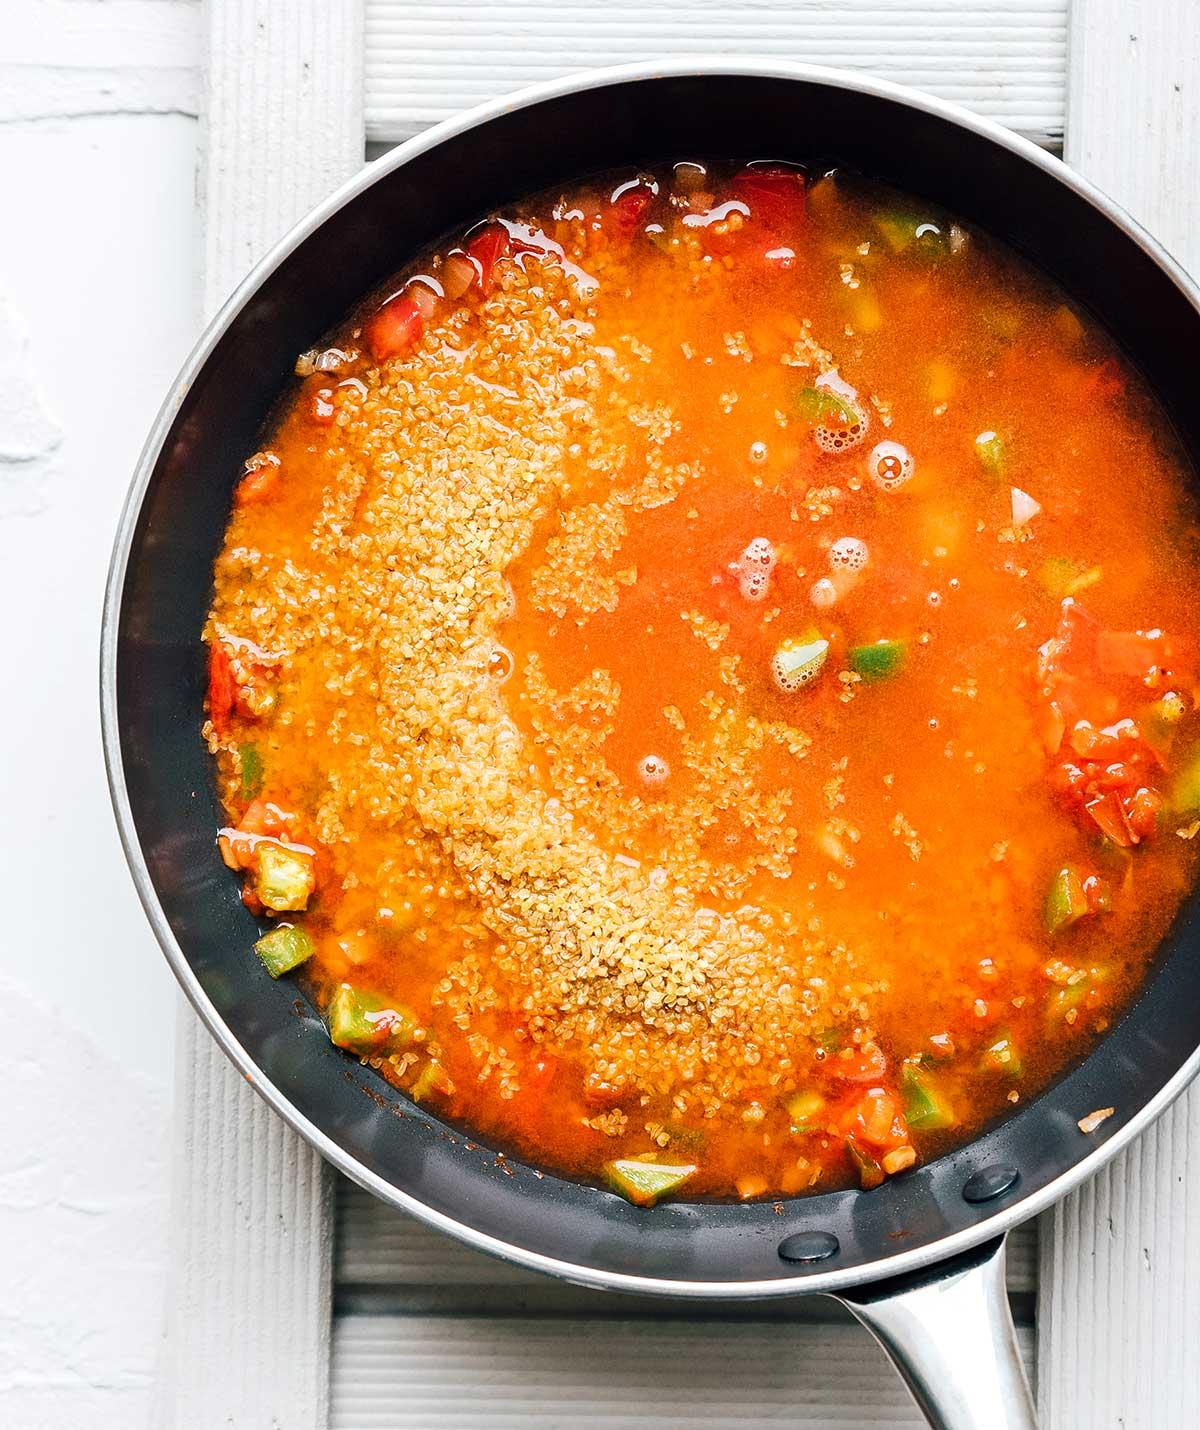 Pan of chopped veggies, diced tomatoes, bulgur, and water.